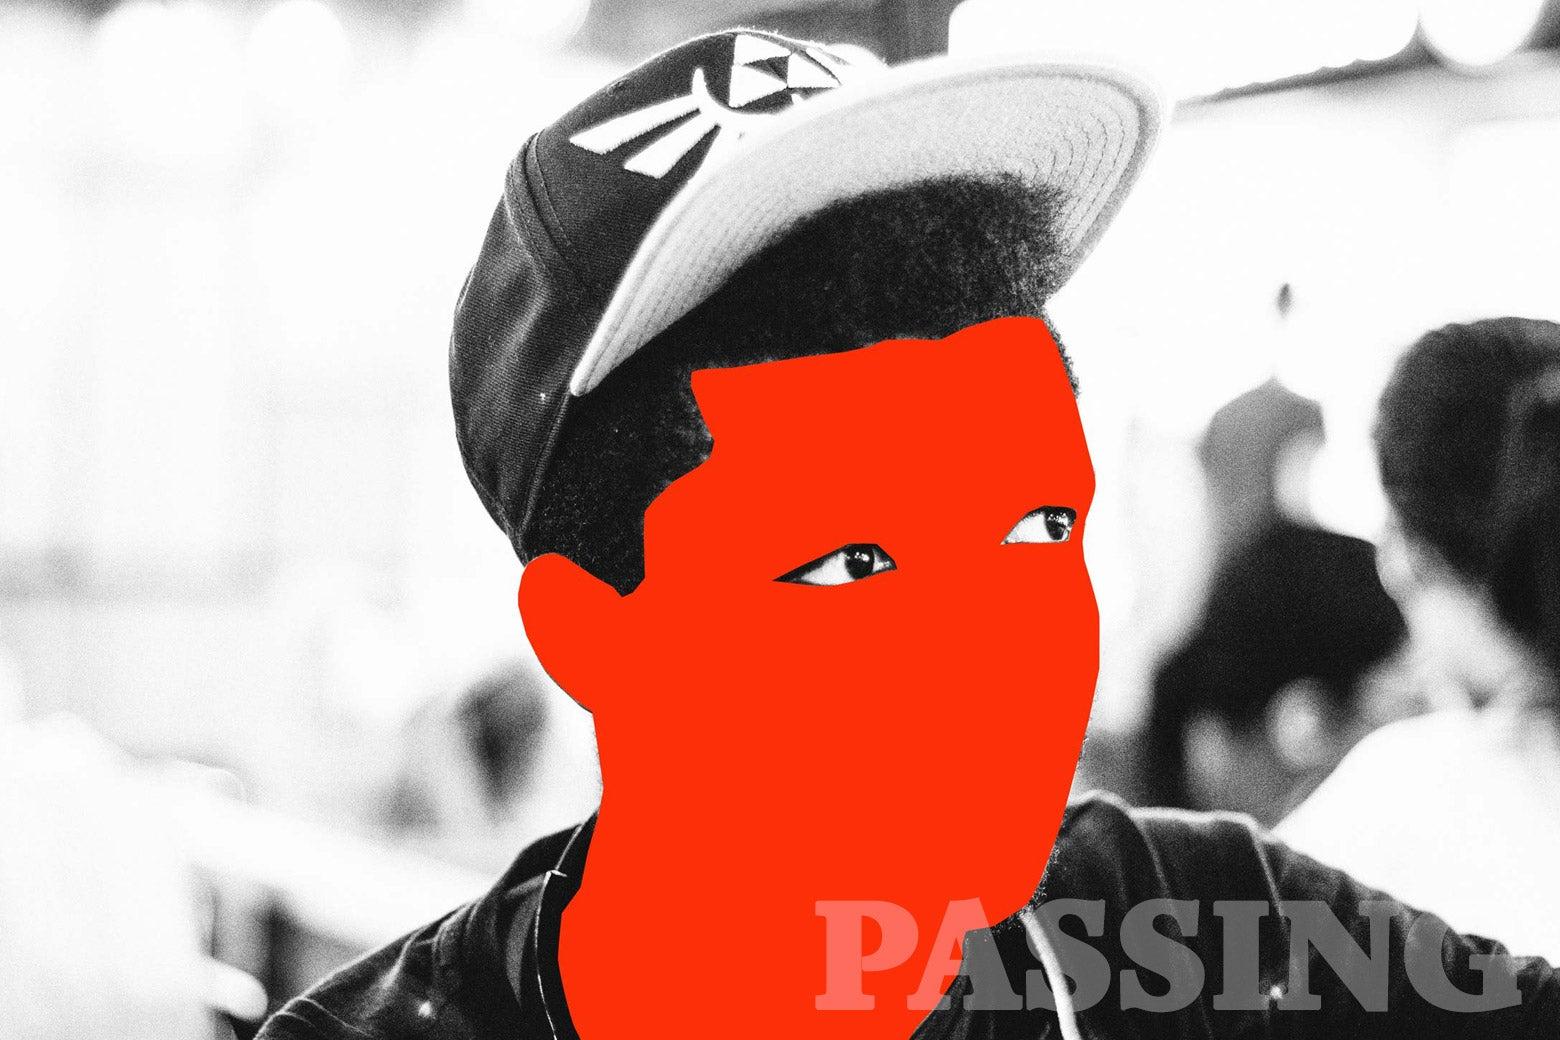 A young black man wearing a baseball hat.